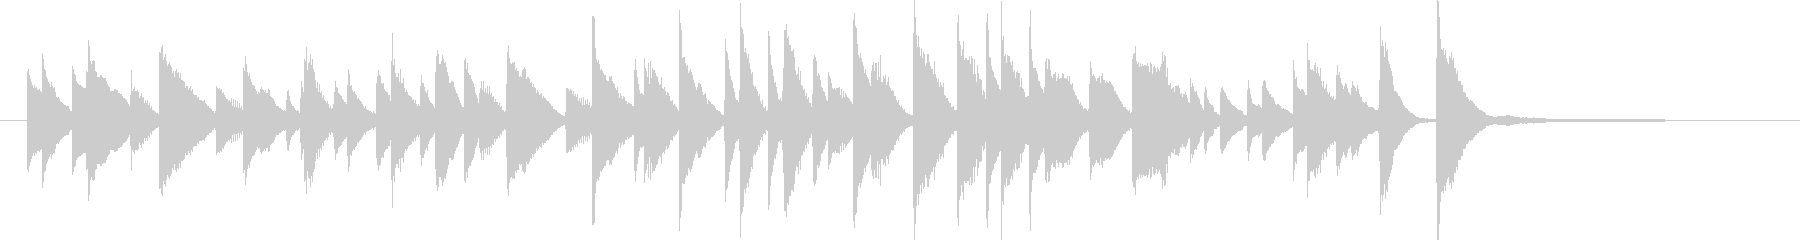 CM15秒、明るく軽快なジャズピアノソロの未再生の波形